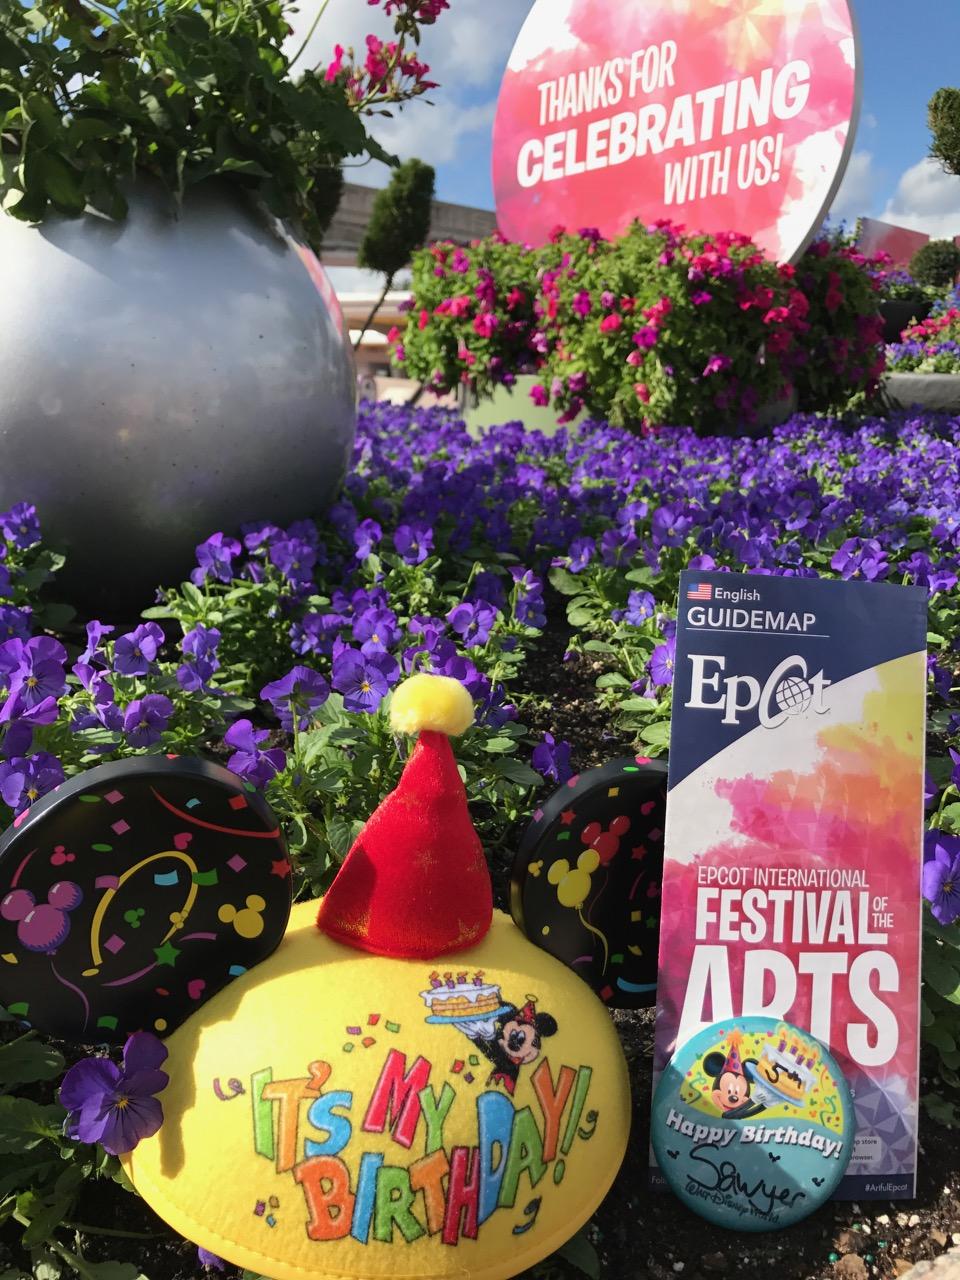 Epcot Festival of the Arts Entrance